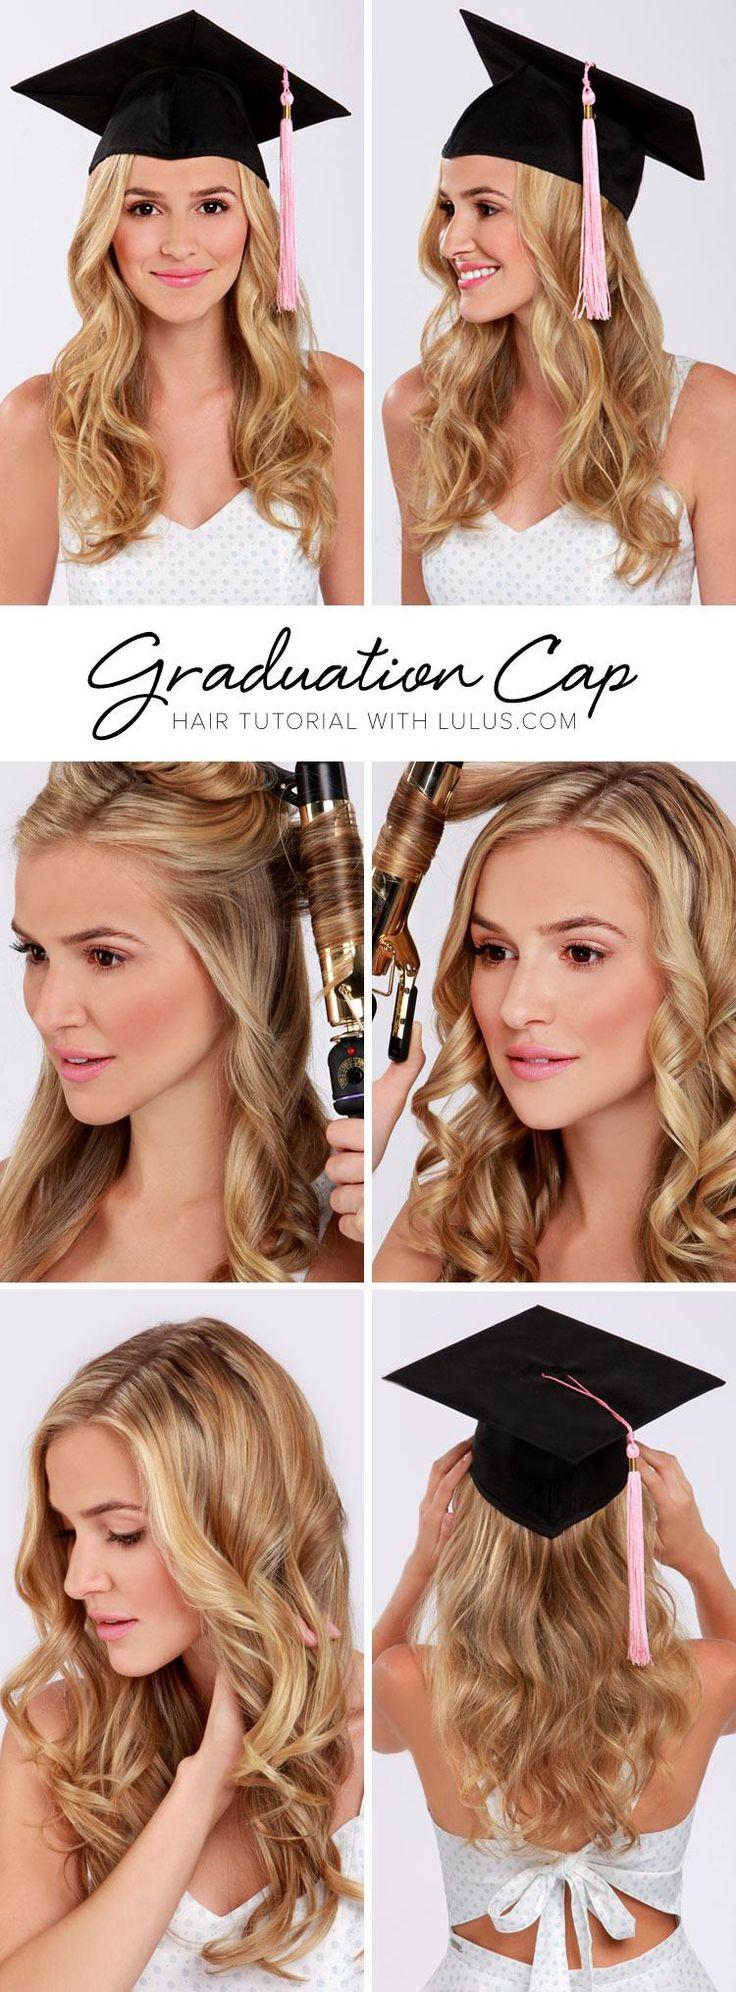 LuLu*s How-To: Graduation Cap Hair Tutorial at LuLus.com!